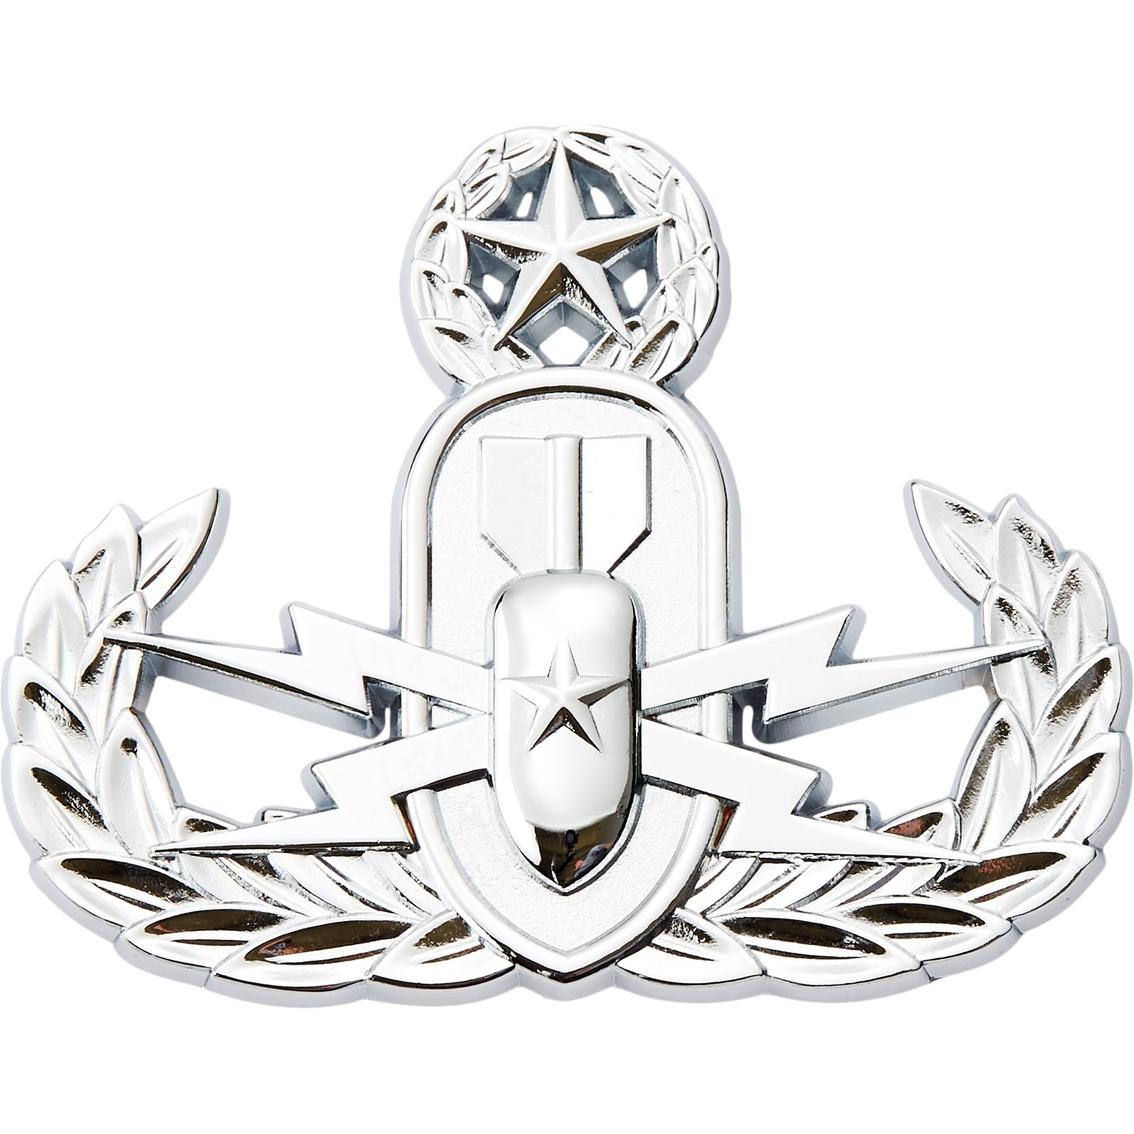 Shadow Six Romeo Master Eod Emblem Military Logo Gear Military